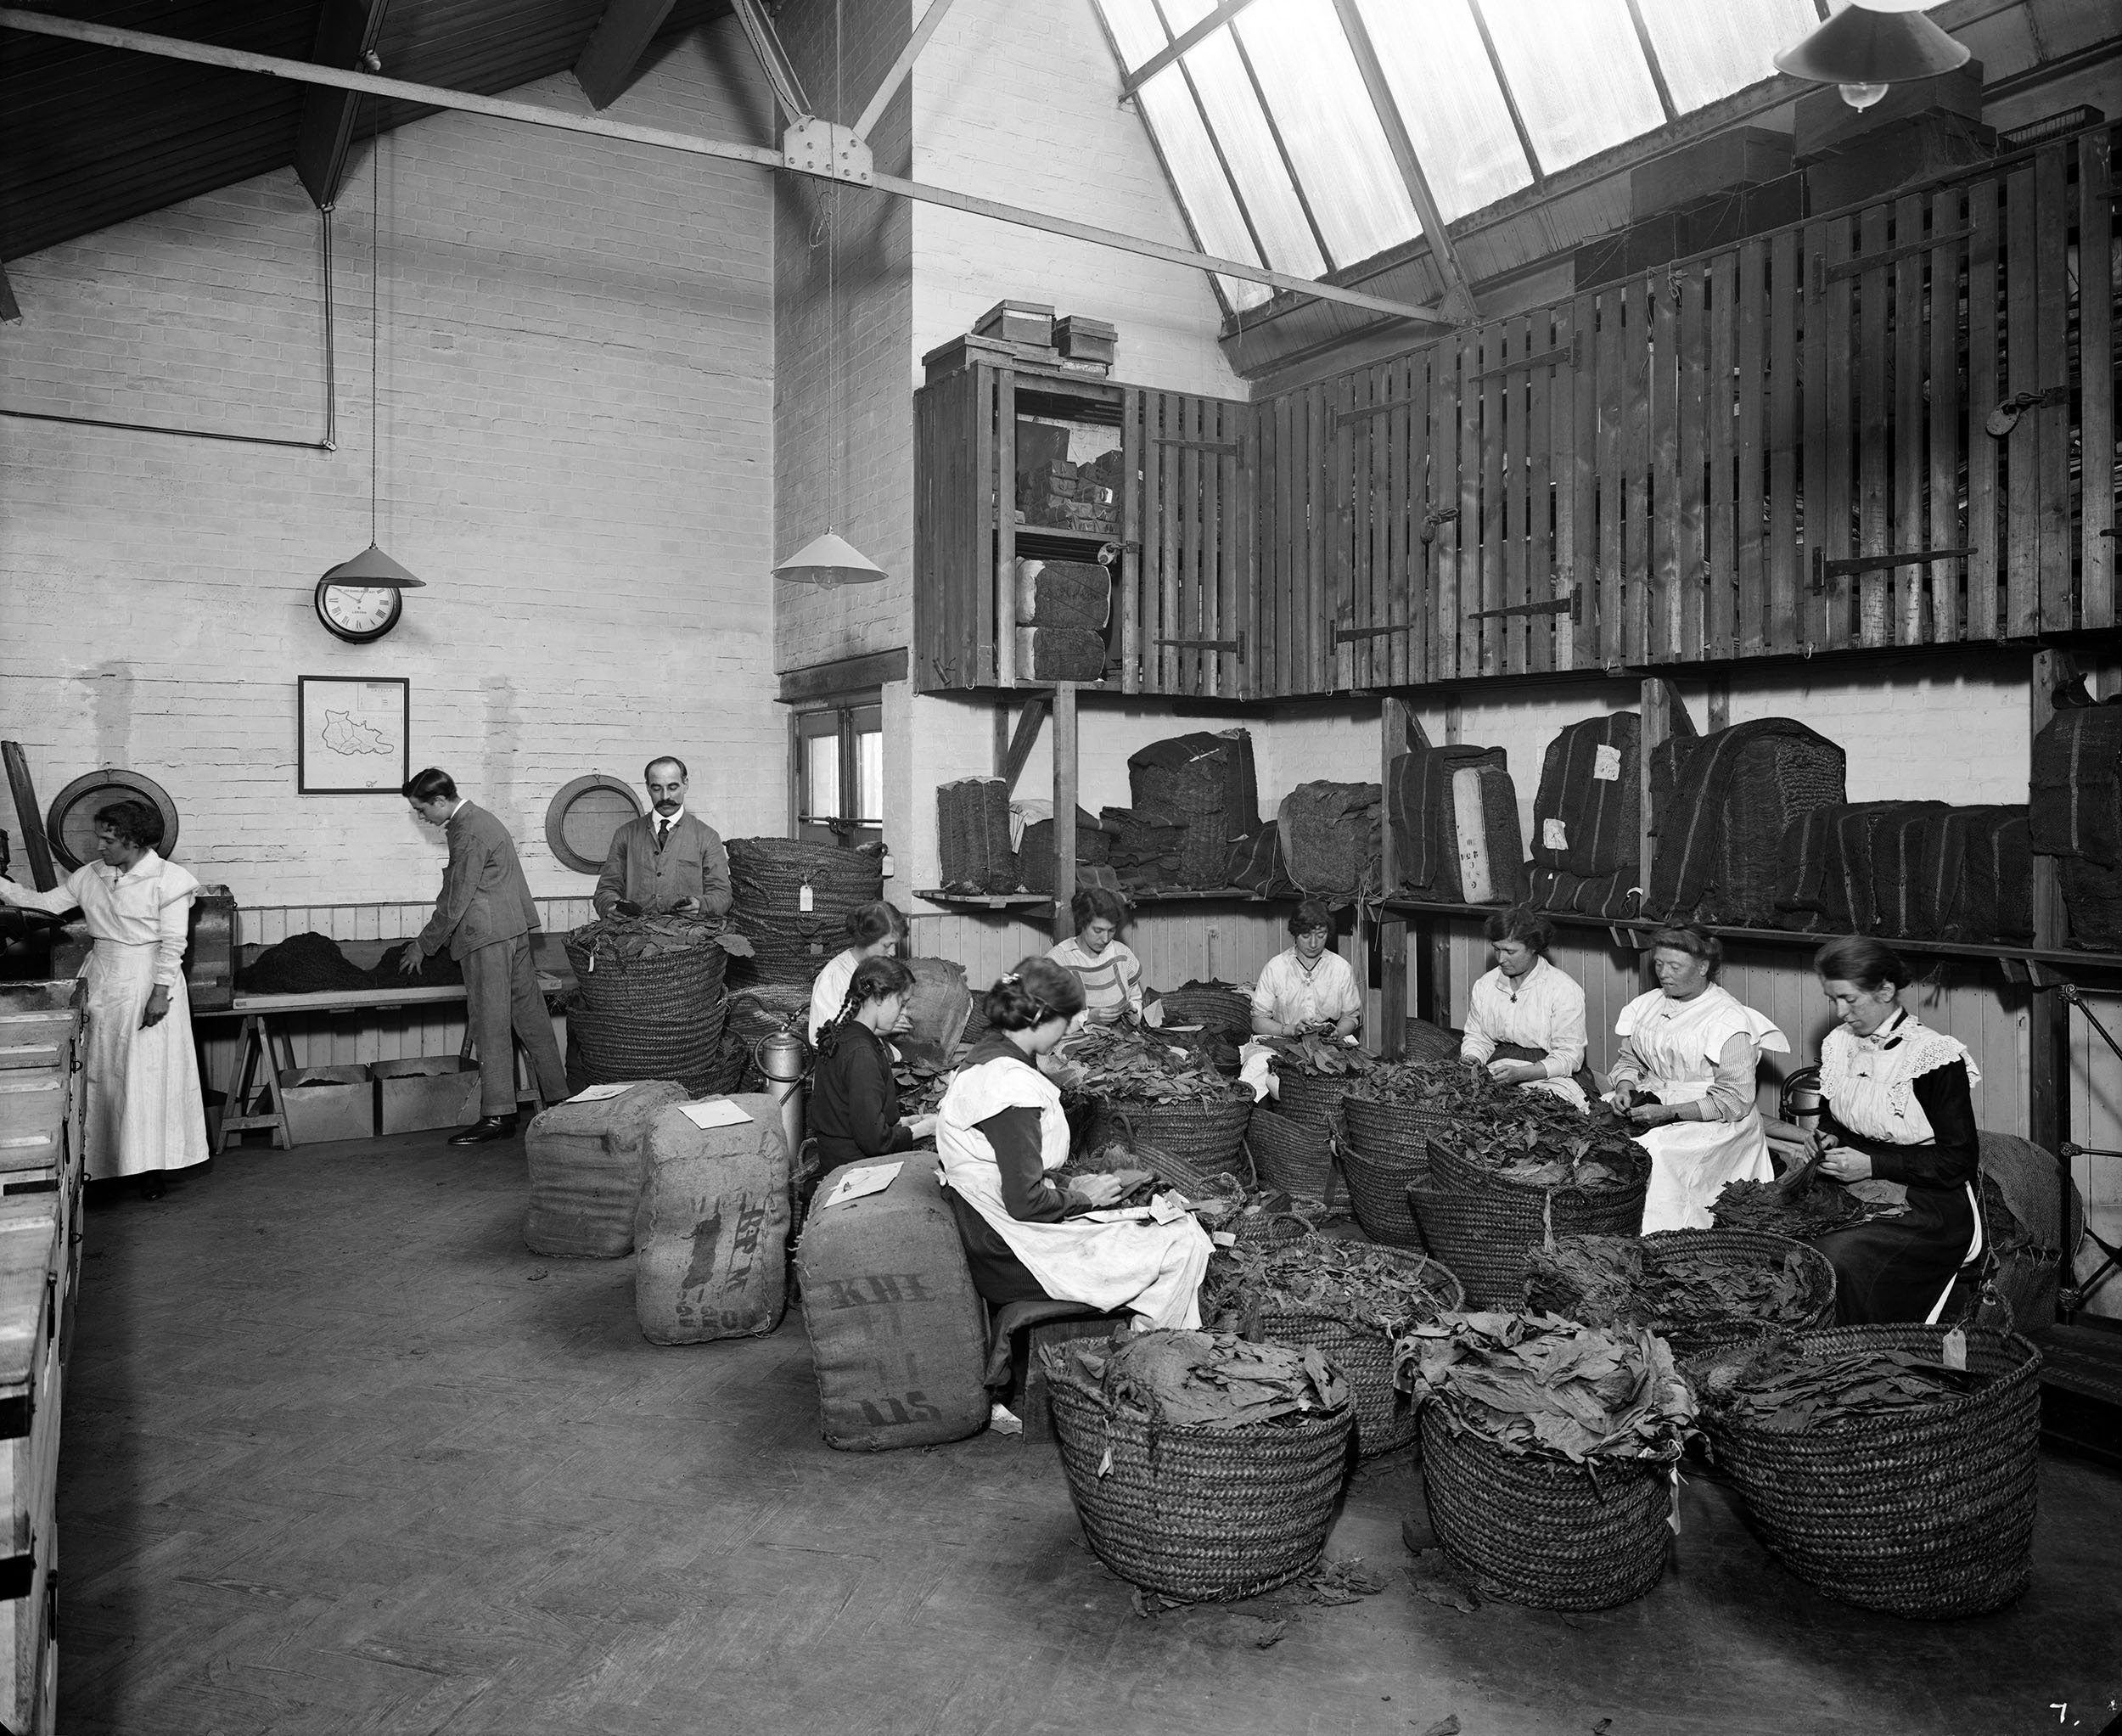 Women leaf-picking tobacco in the Turkish leaf room, Teafani & Co Works, Brixton, London, U.K., 1916. (Getty Images)